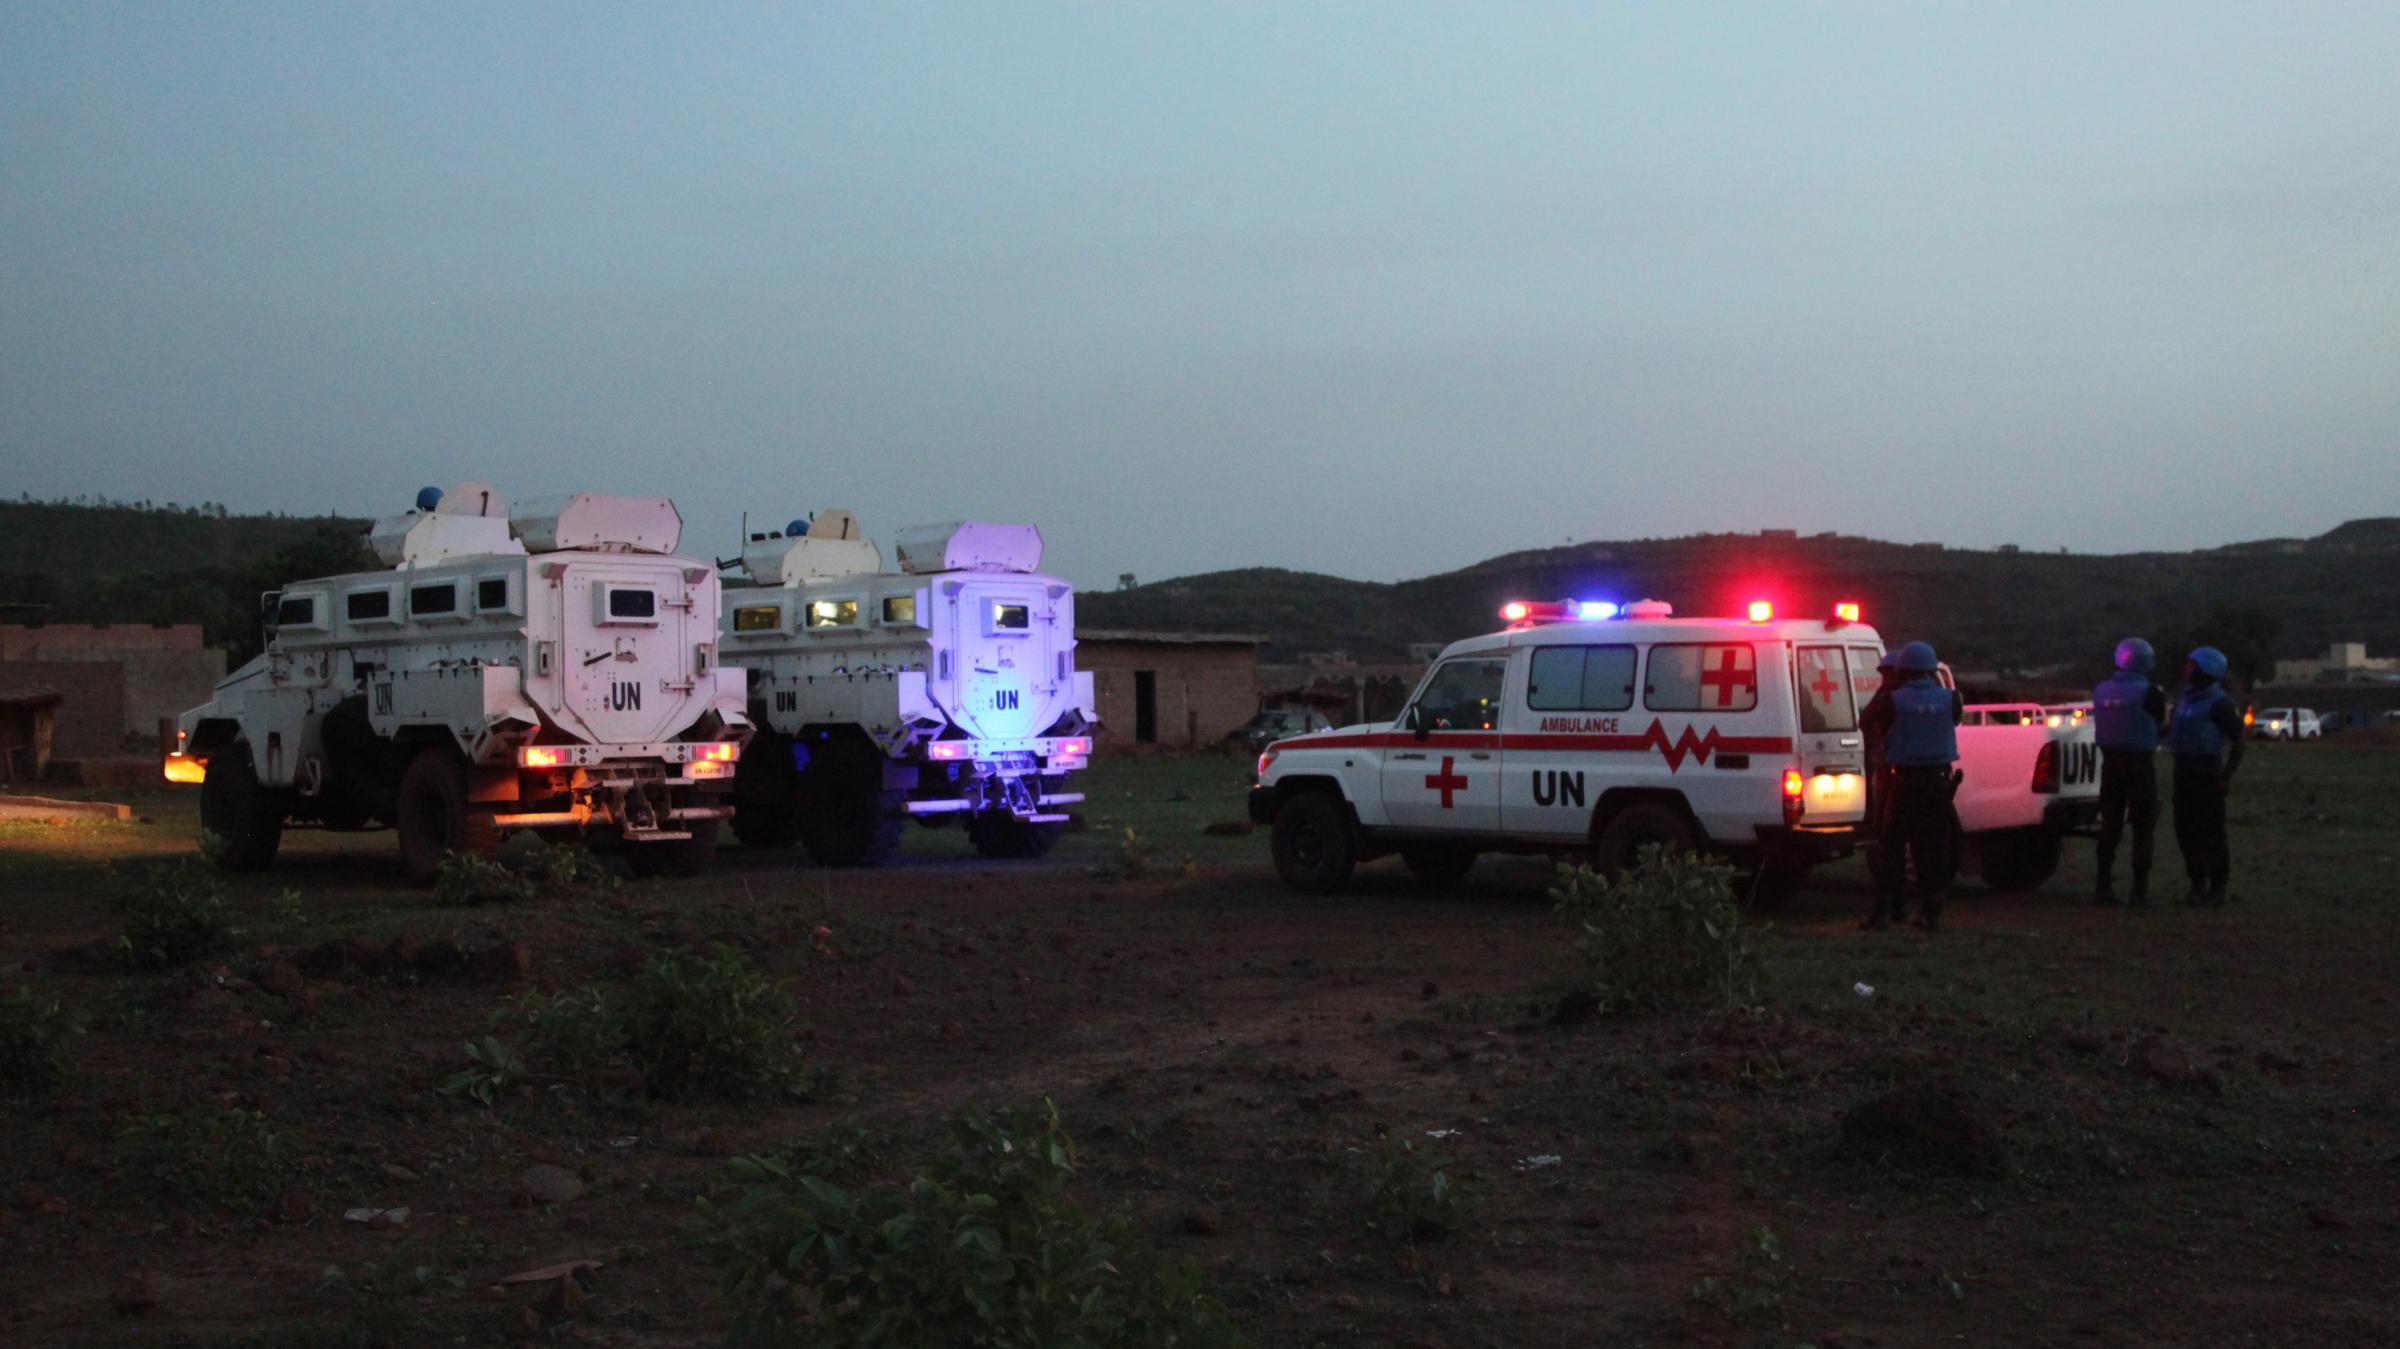 Brutal attack on a resort in Mali